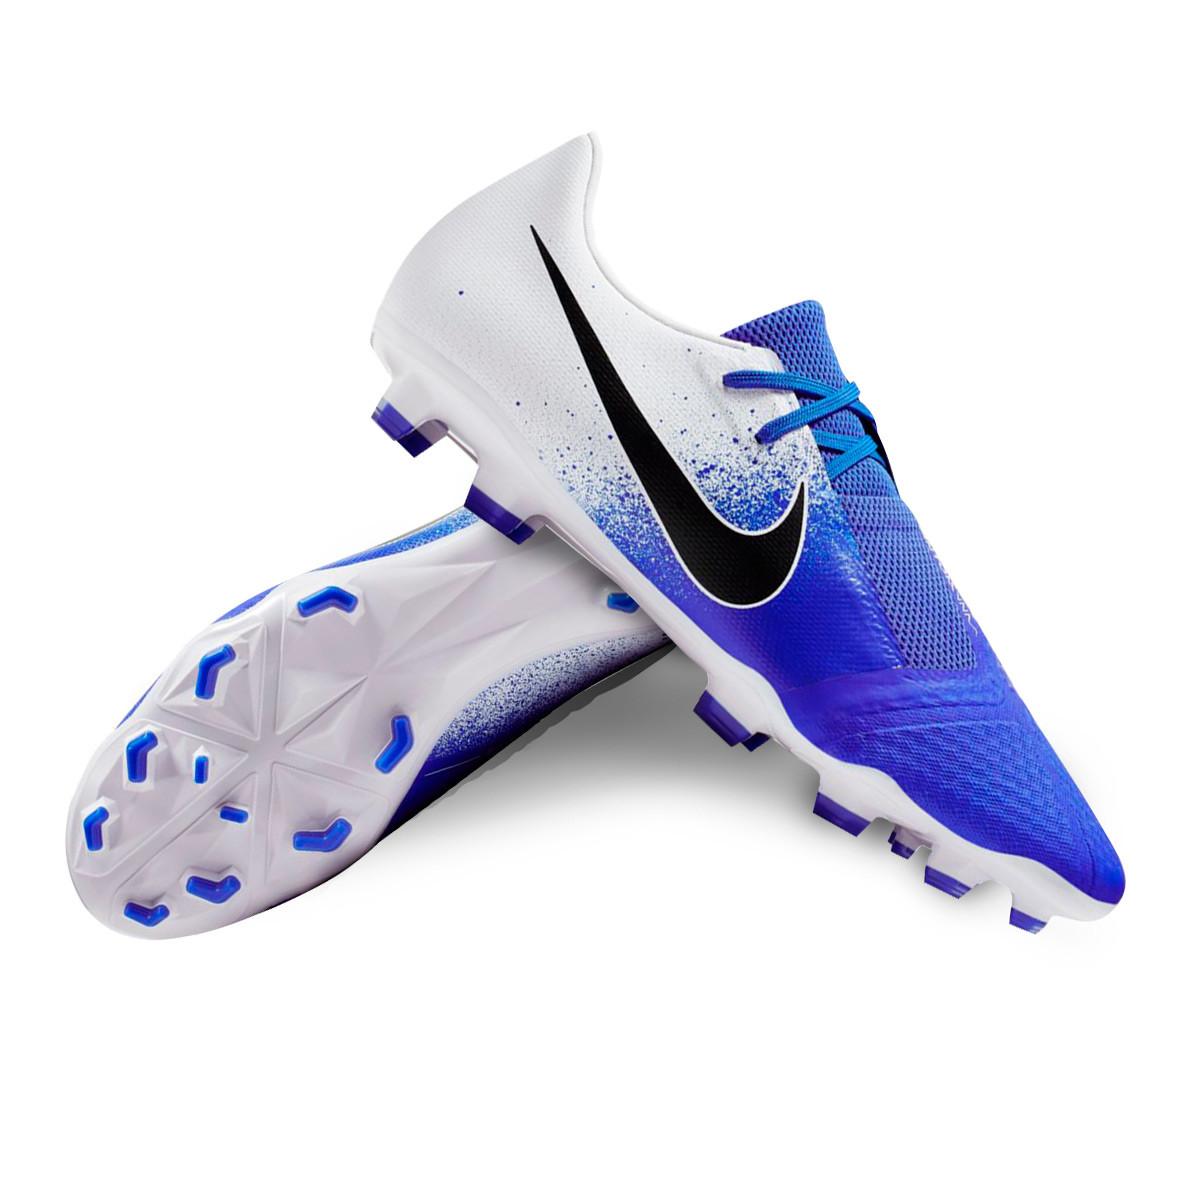 376abfe220b0 Football Boots Nike Phantom Venom Academy FG White-Black-Racer blue -  Football store Fútbol Emotion